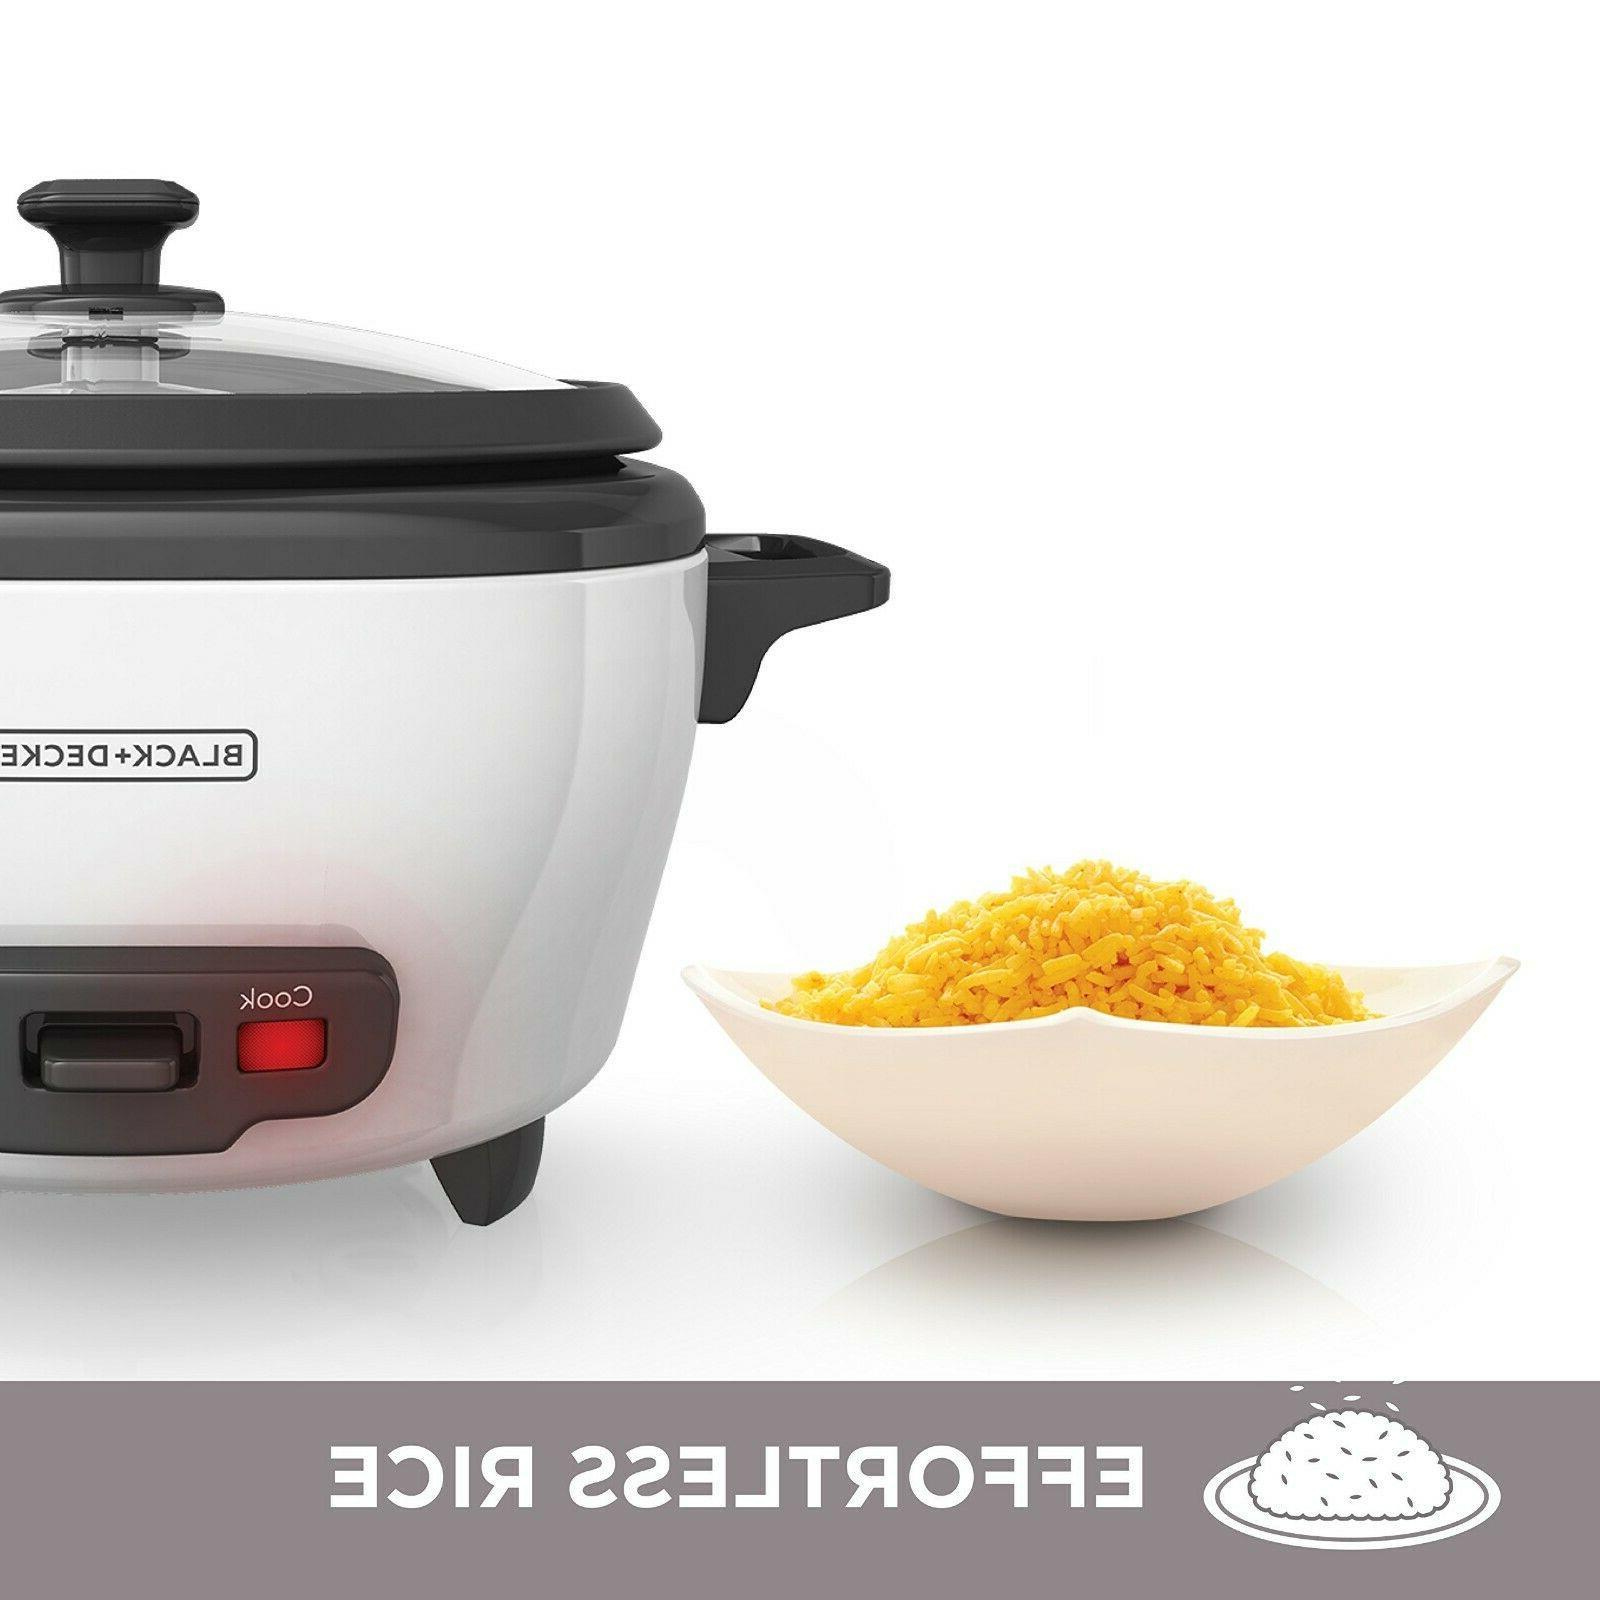 BLACK+DECKER Cooker 6-cup White Food Steamer